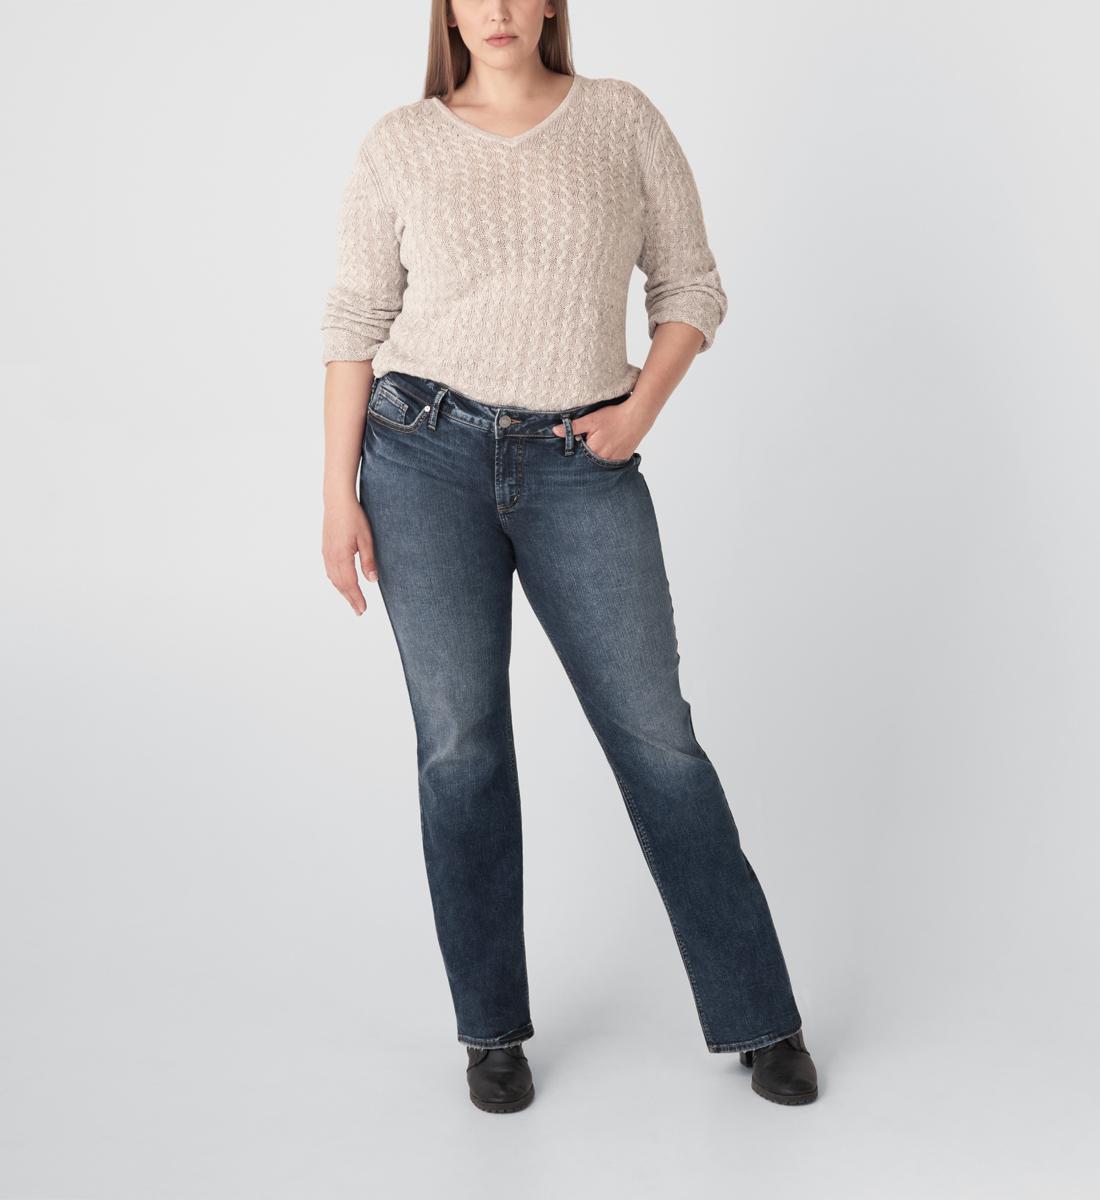 Silver Jeans Elyse Mid Rise Slim Bootcut Jeans Plus Size